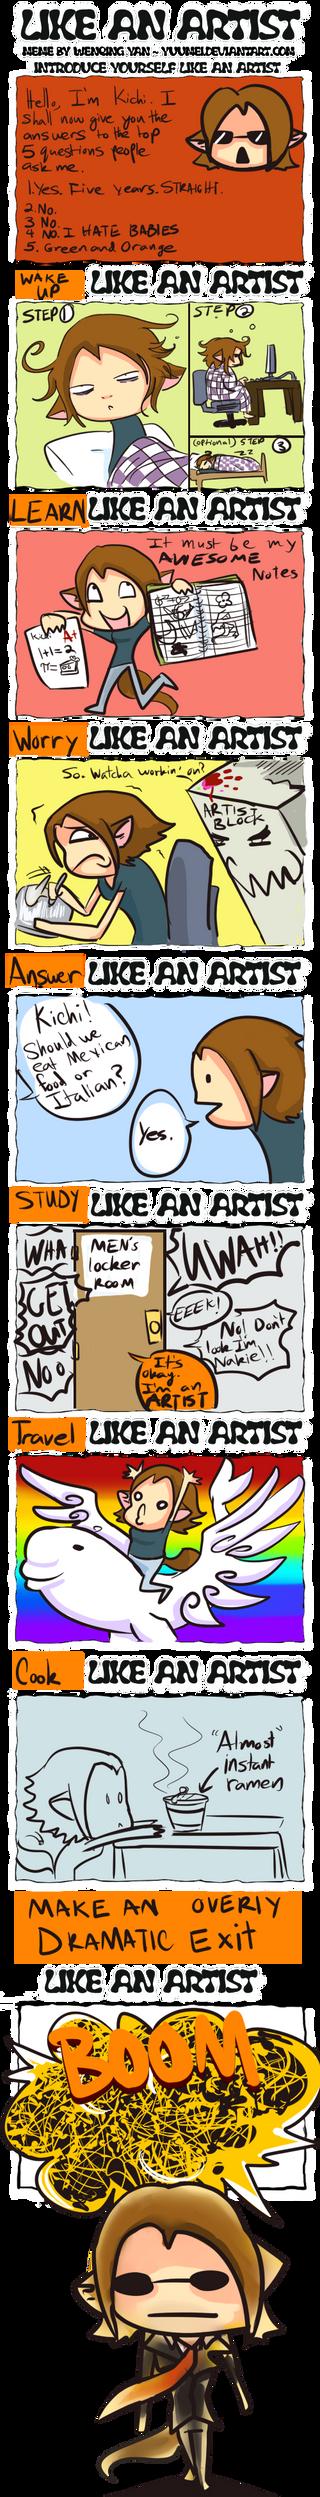 Like an ARTIST by Avibroso